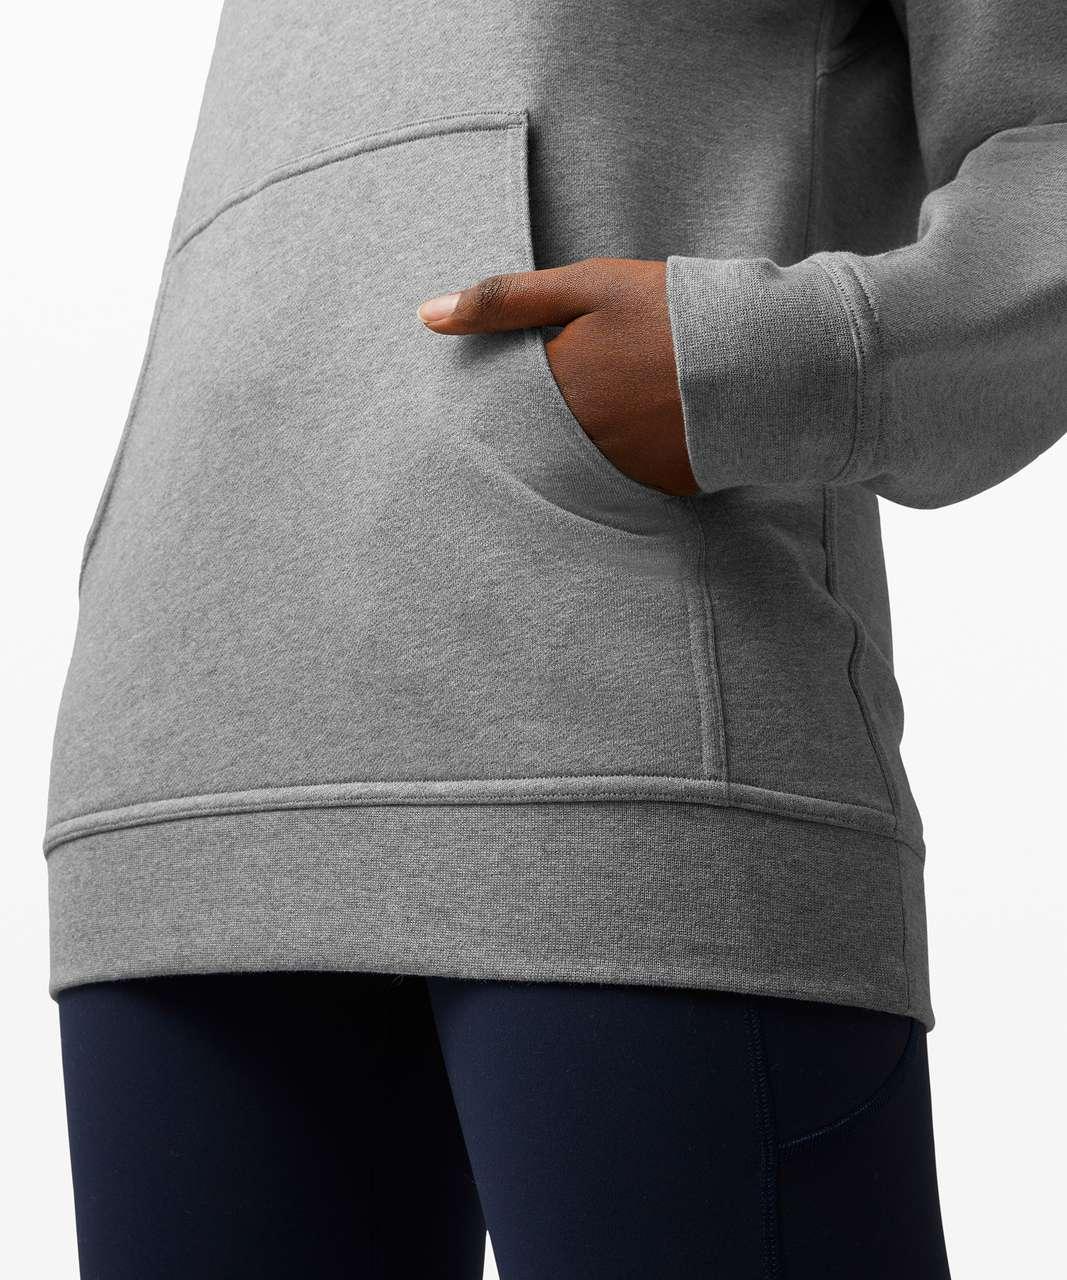 Lululemon All Yours Hoodie *Terry - Heathered Core Medium Grey